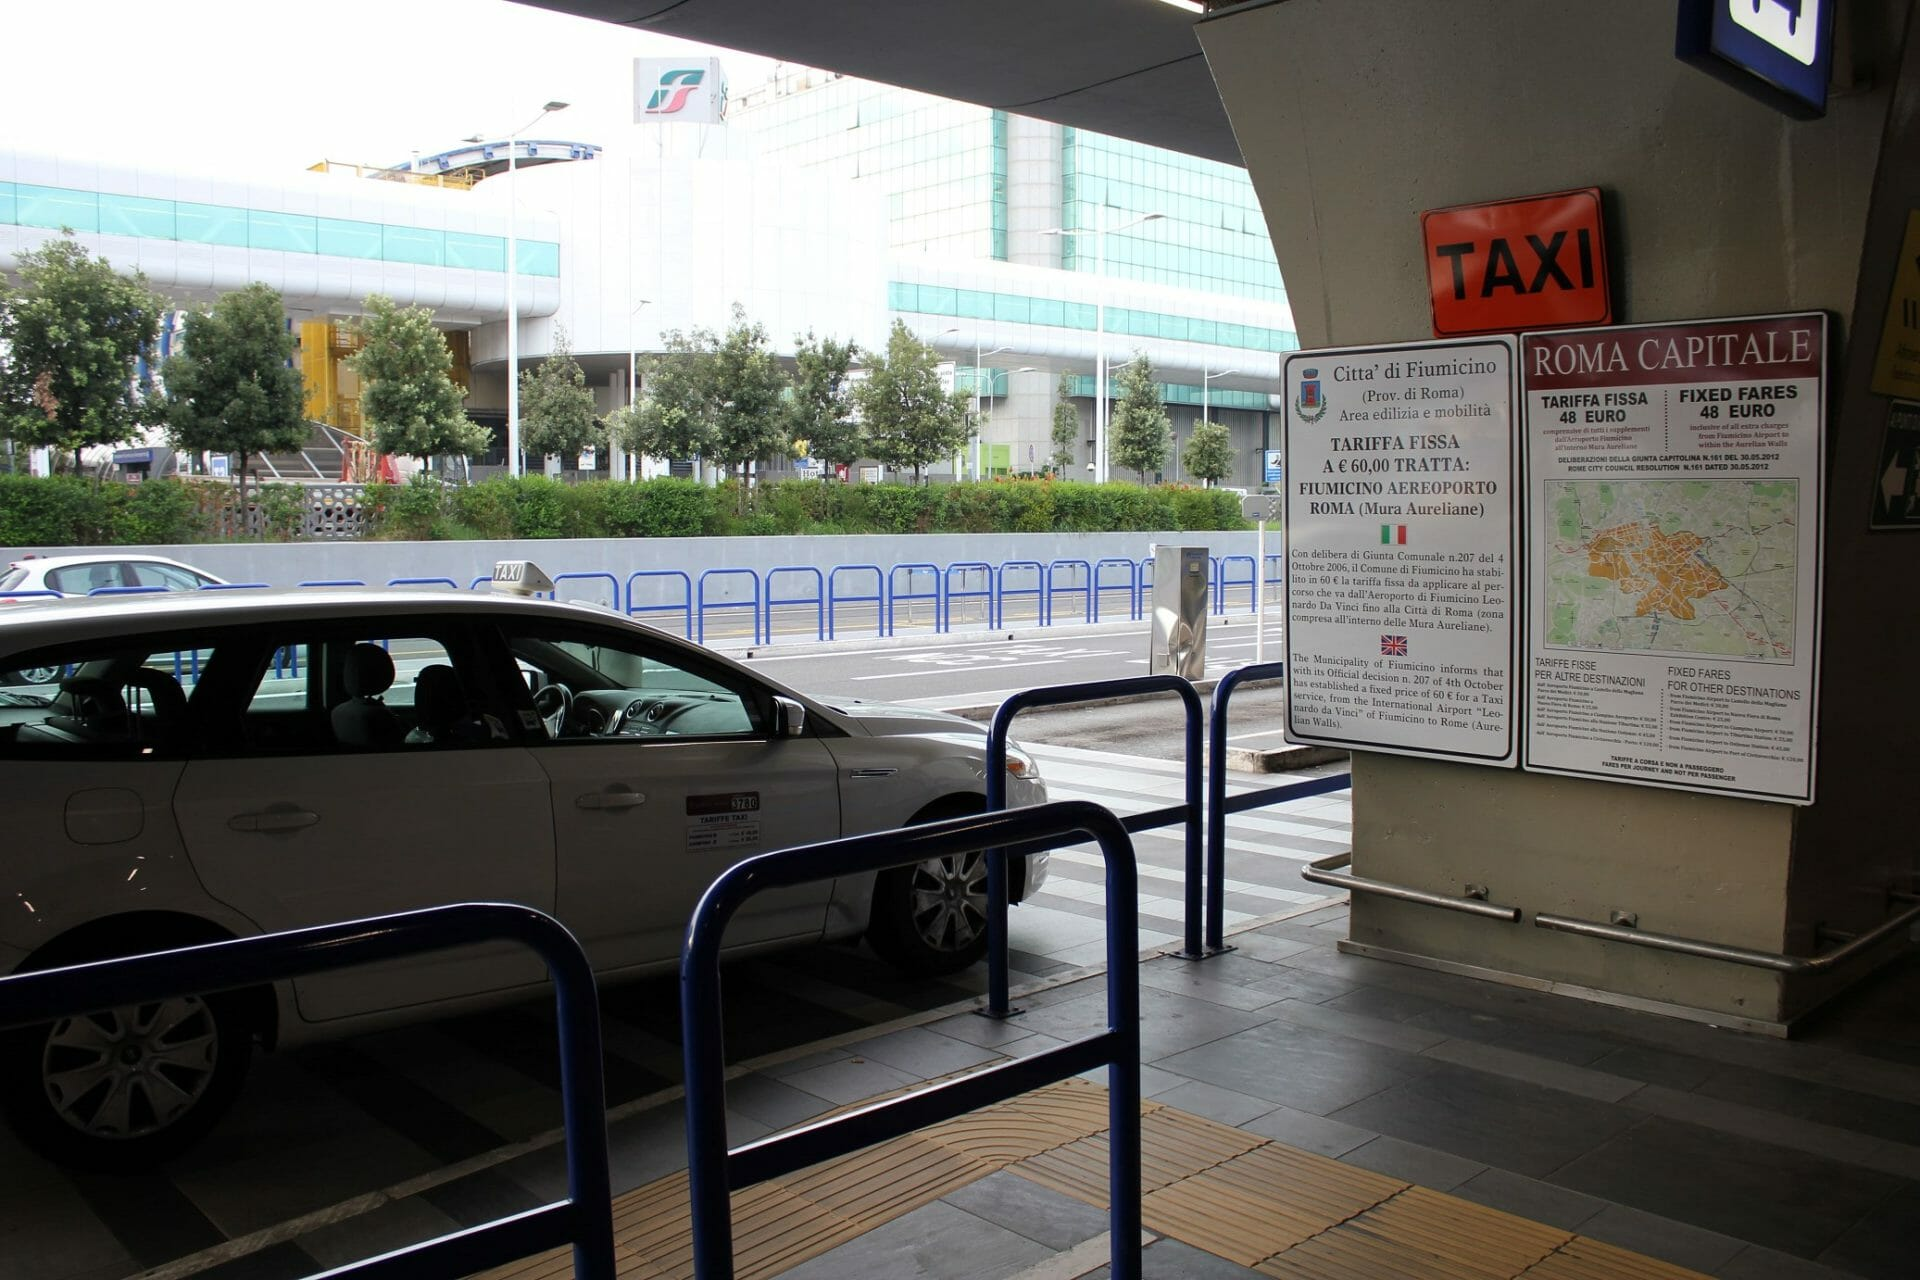 Airport Taxi Fiuminico